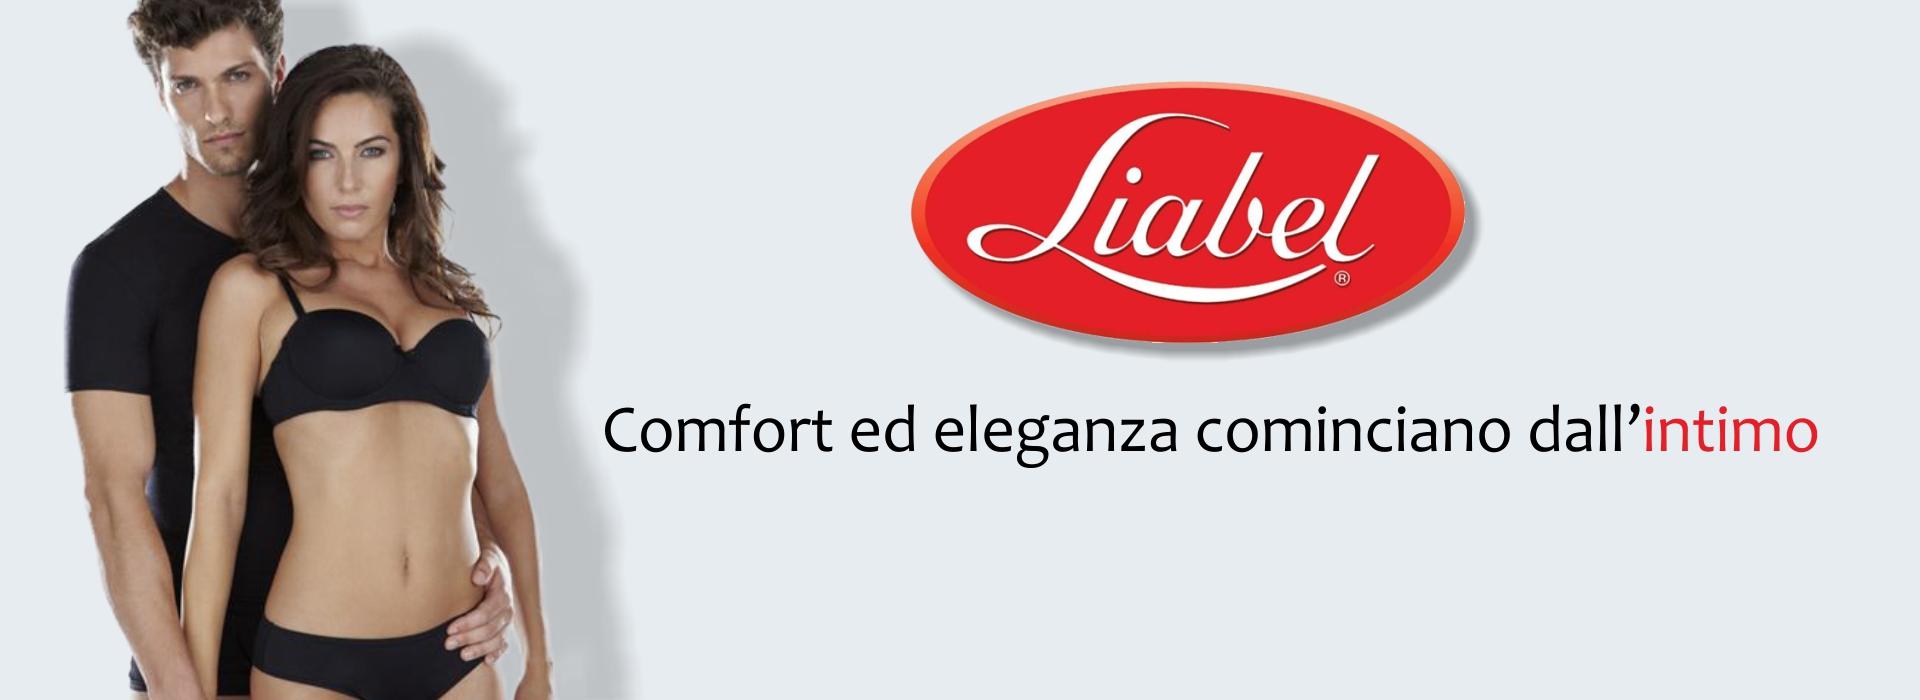 liabel intimo comfort ed eleganza